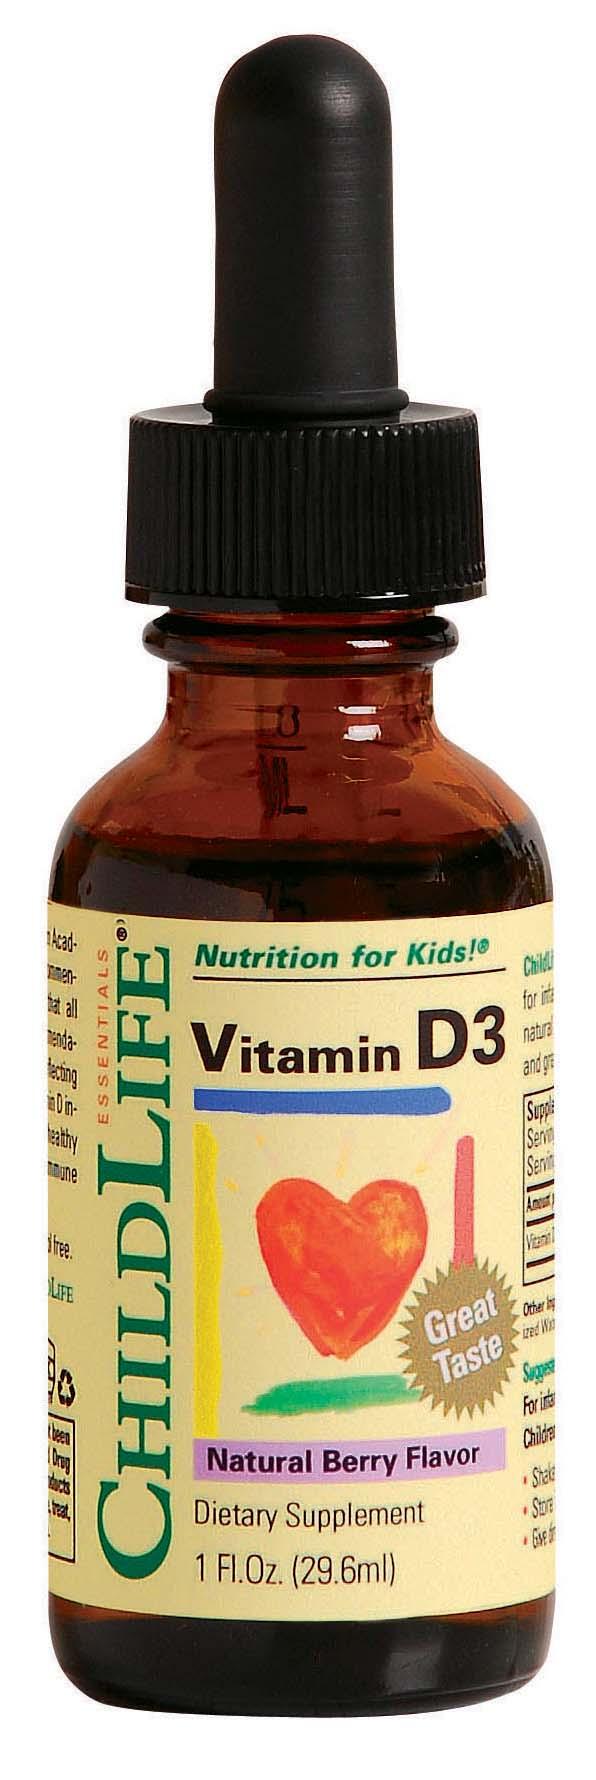 Child Life Vitamin D3